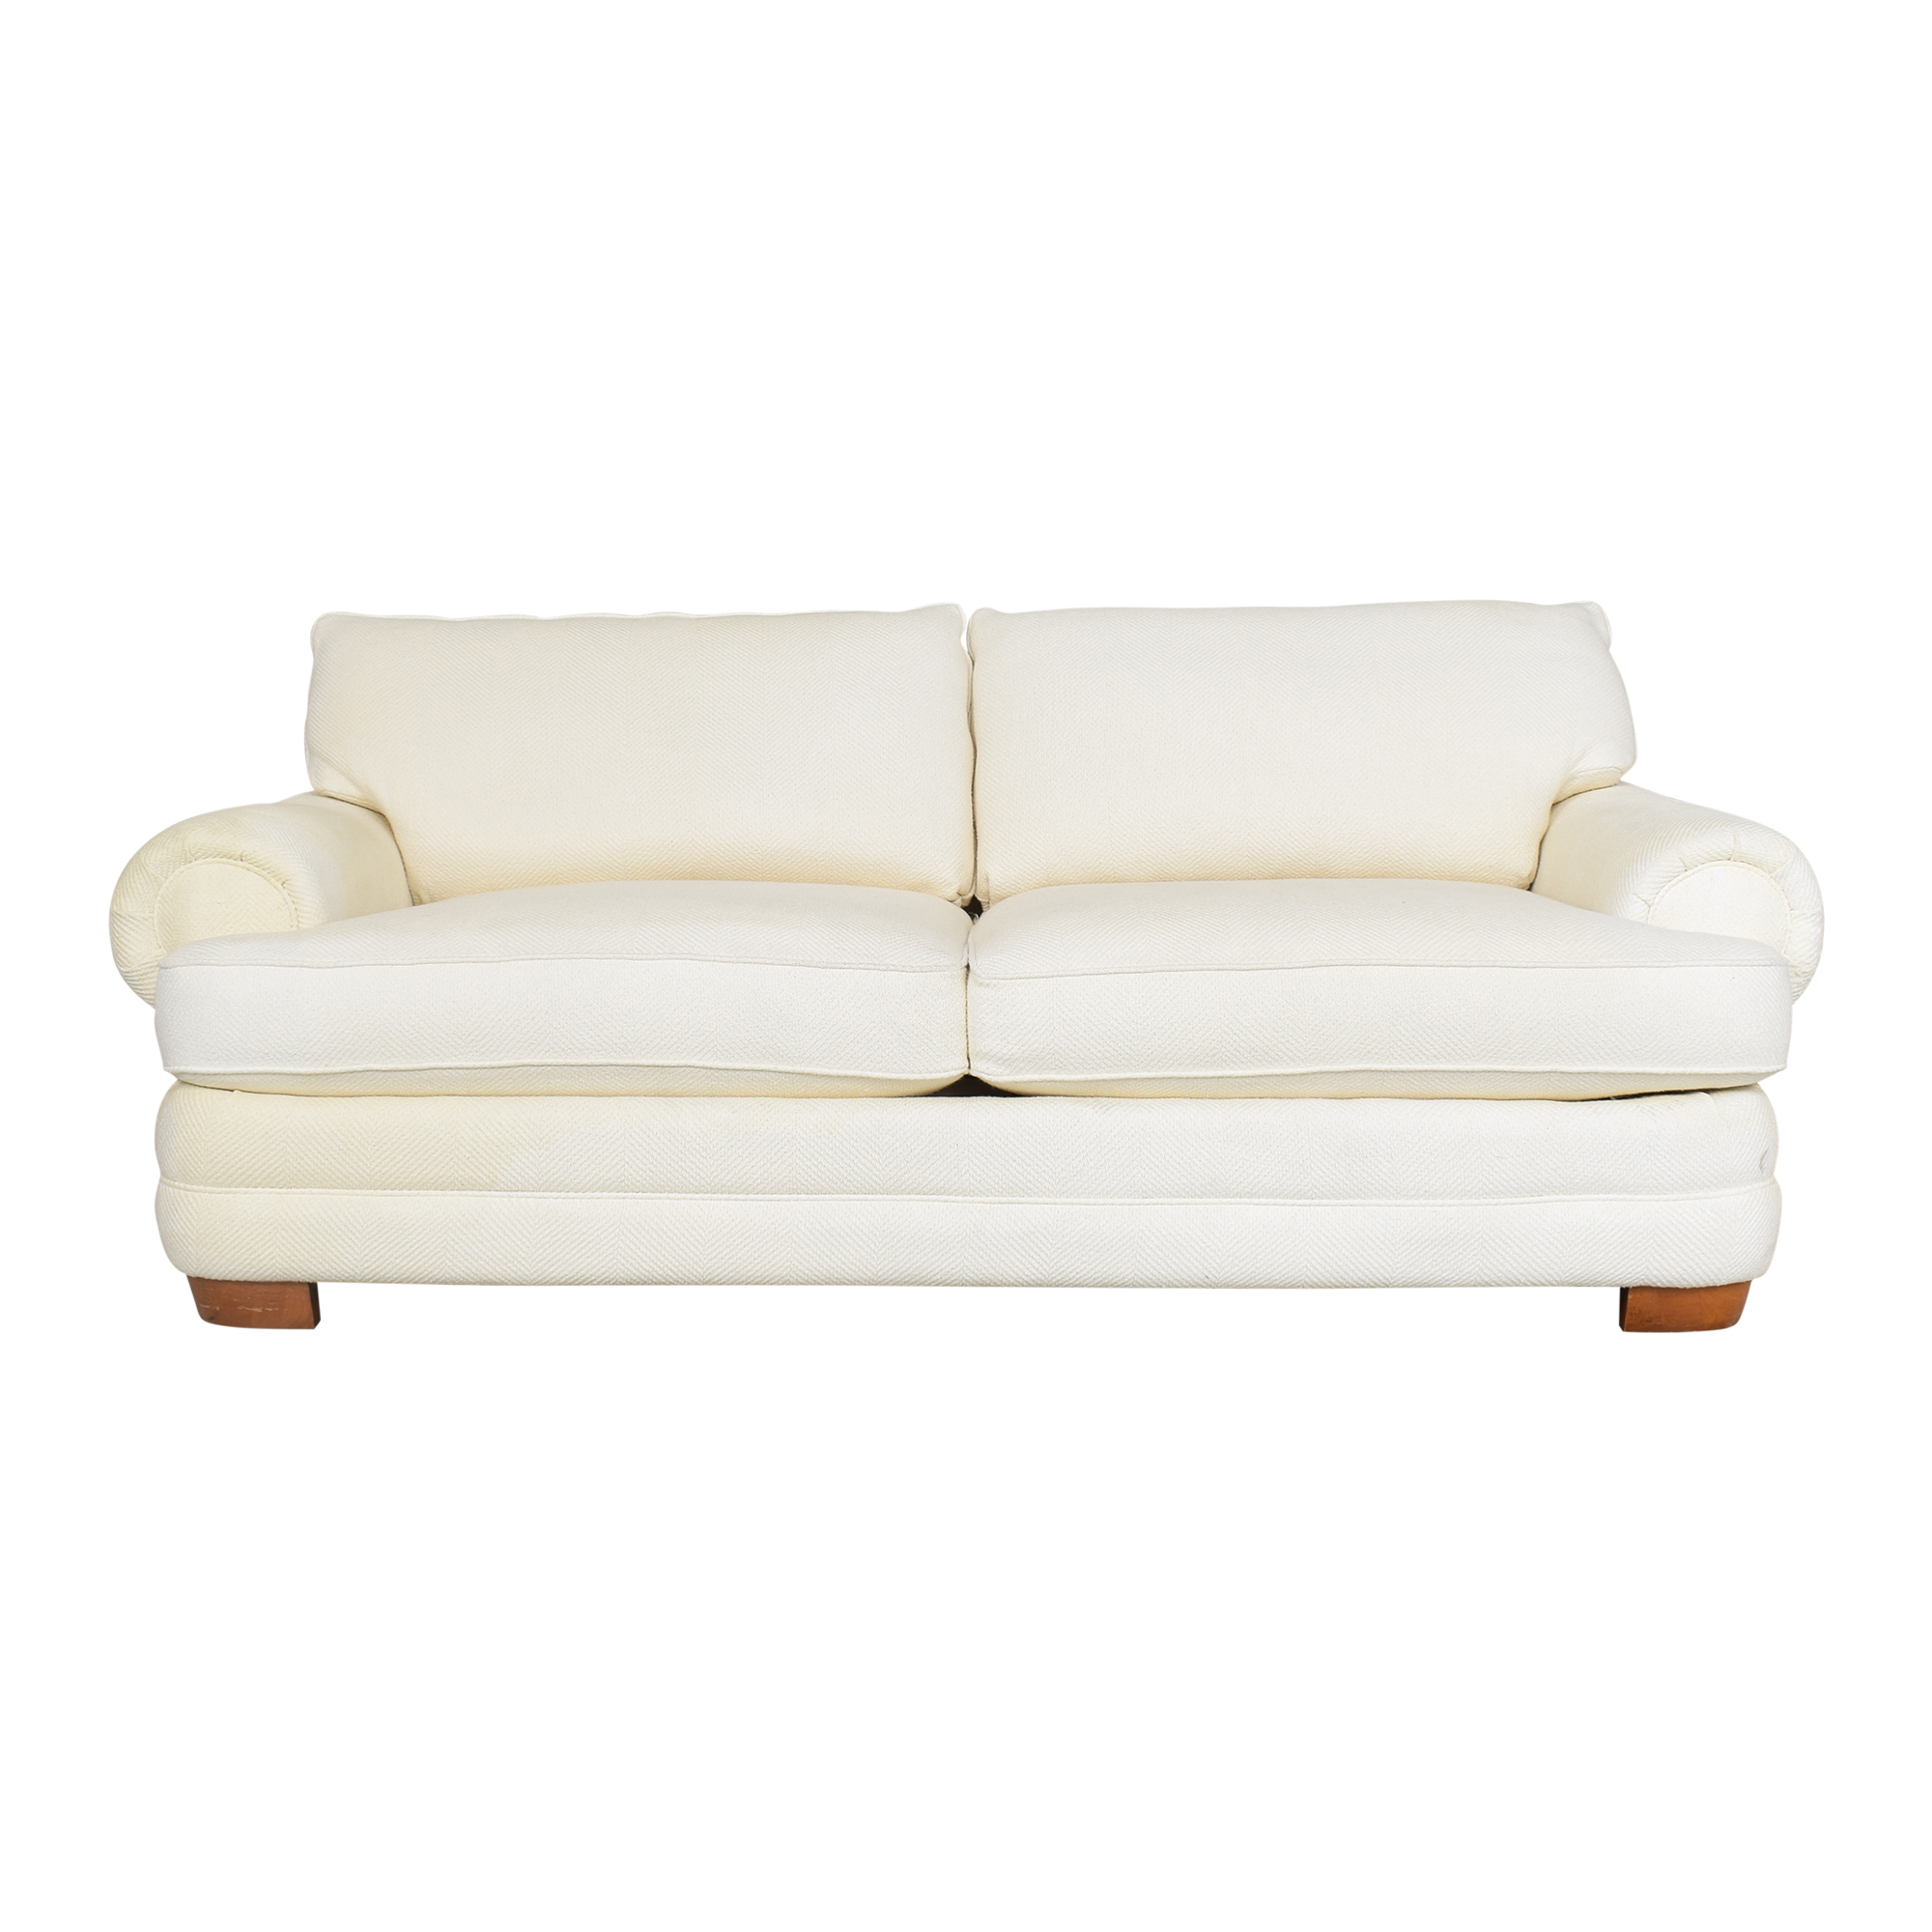 Bassett Furniture Bassett Furniture Two Cushion Roll Arm Sofa coupon